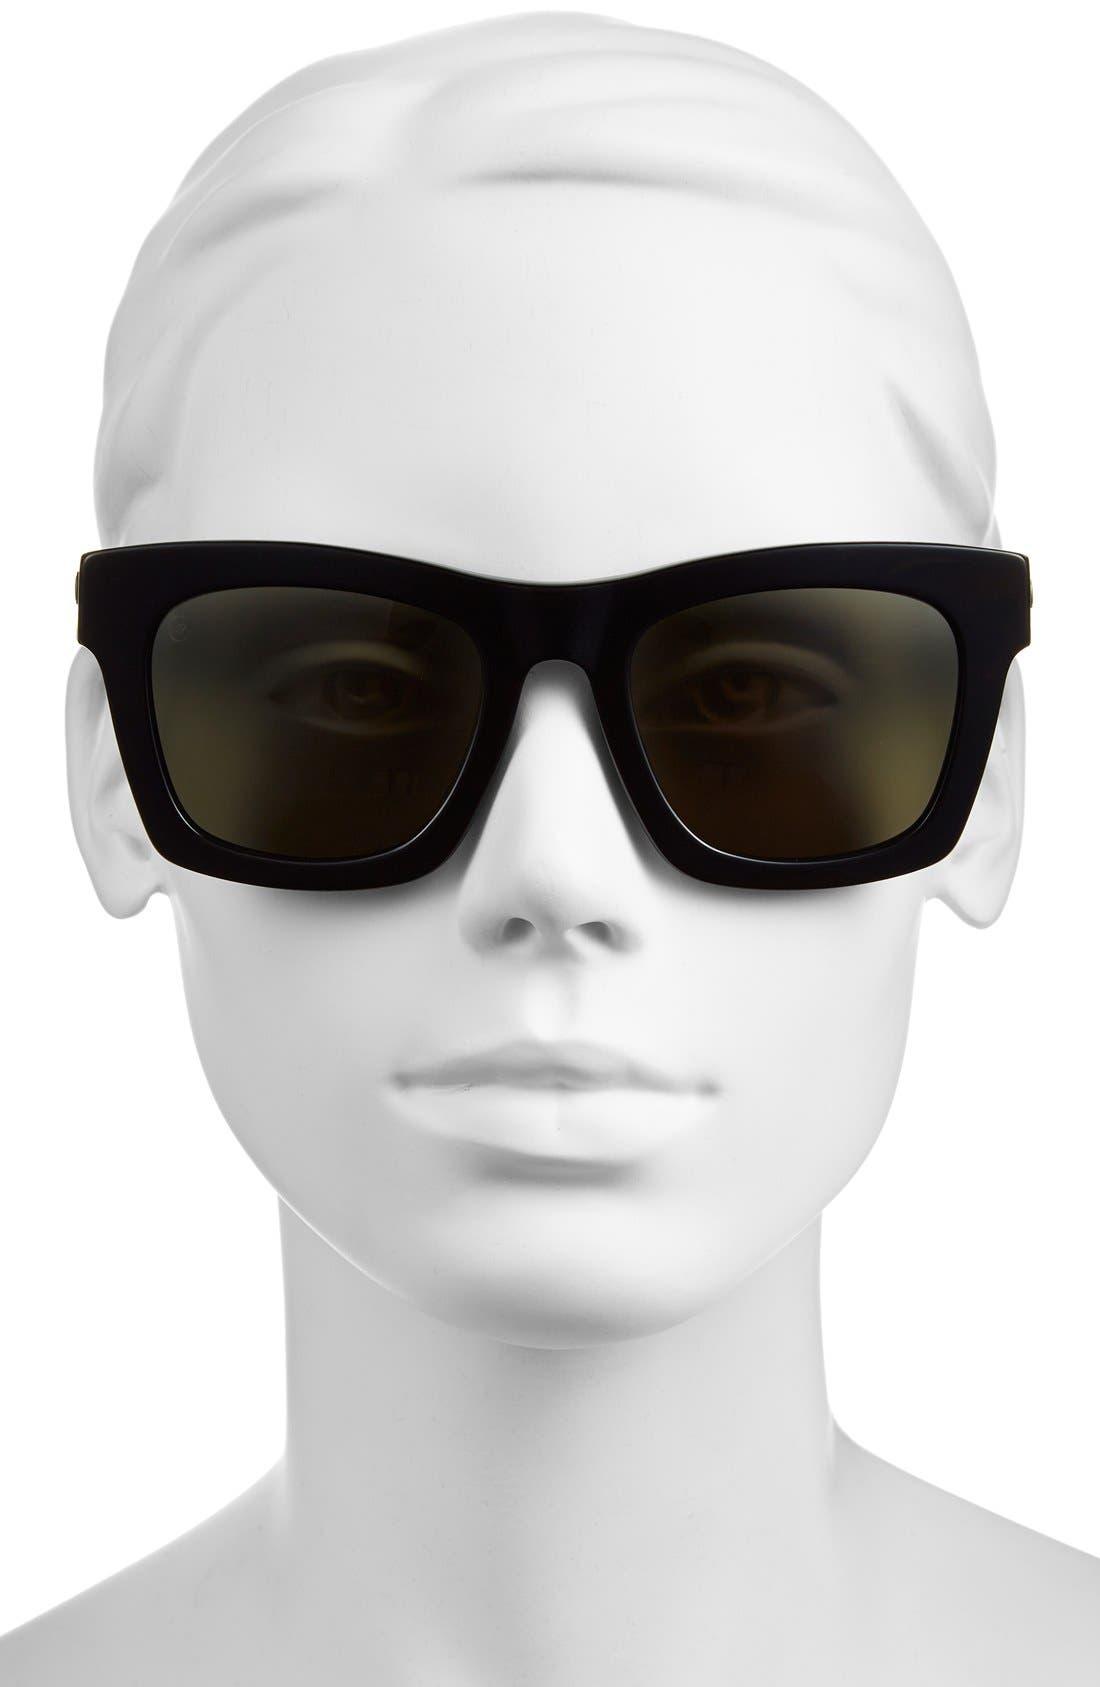 'Crasher' 54mm Retro Sunglasses,                             Alternate thumbnail 3, color,                             GLOSS BLACK/ GREY